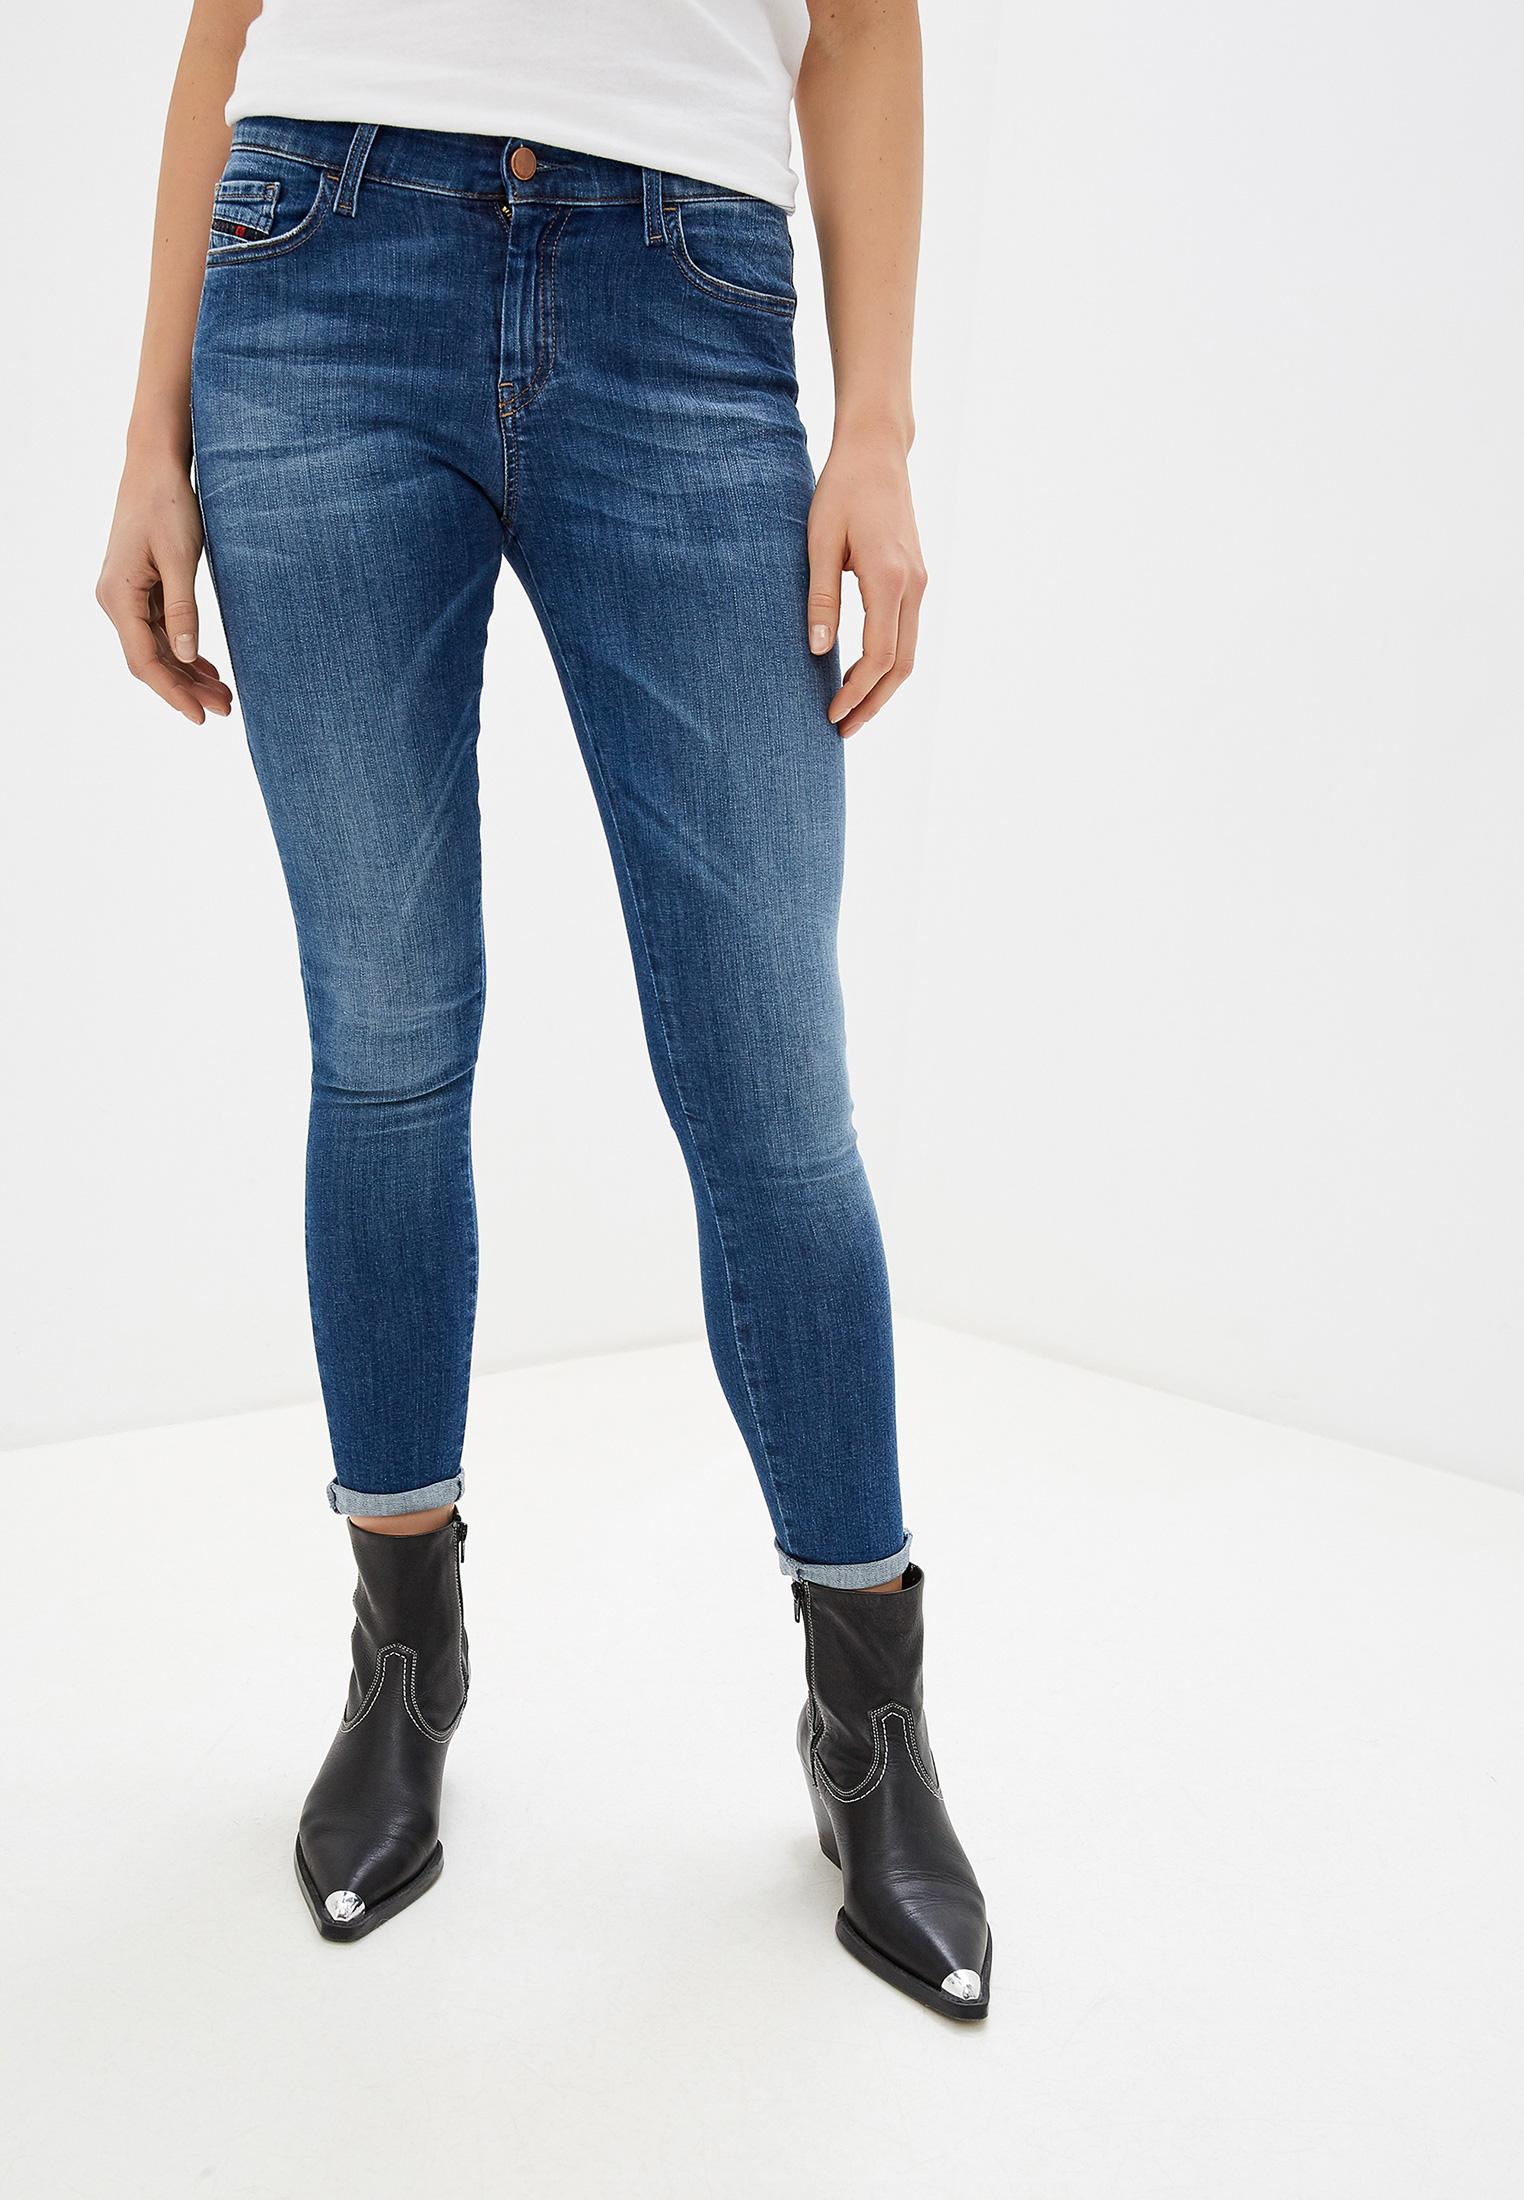 Зауженные джинсы Diesel (Дизель) 00SXJM0826F